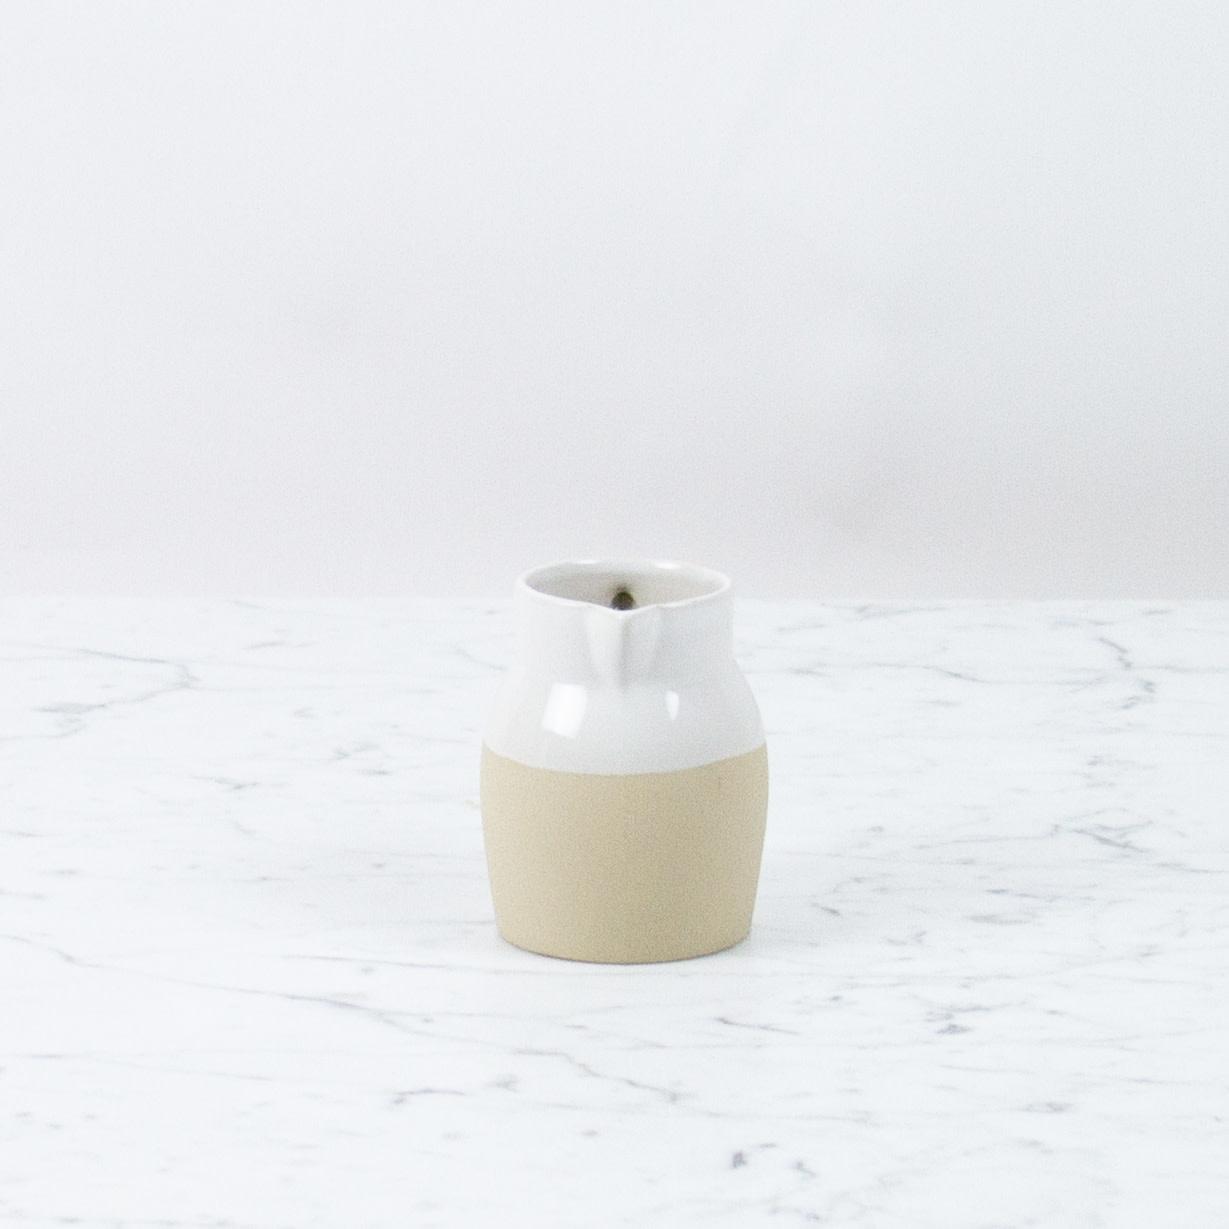 "Manufacture de Digoin Manufacture de Digoin Small White Pitcher - 4"""